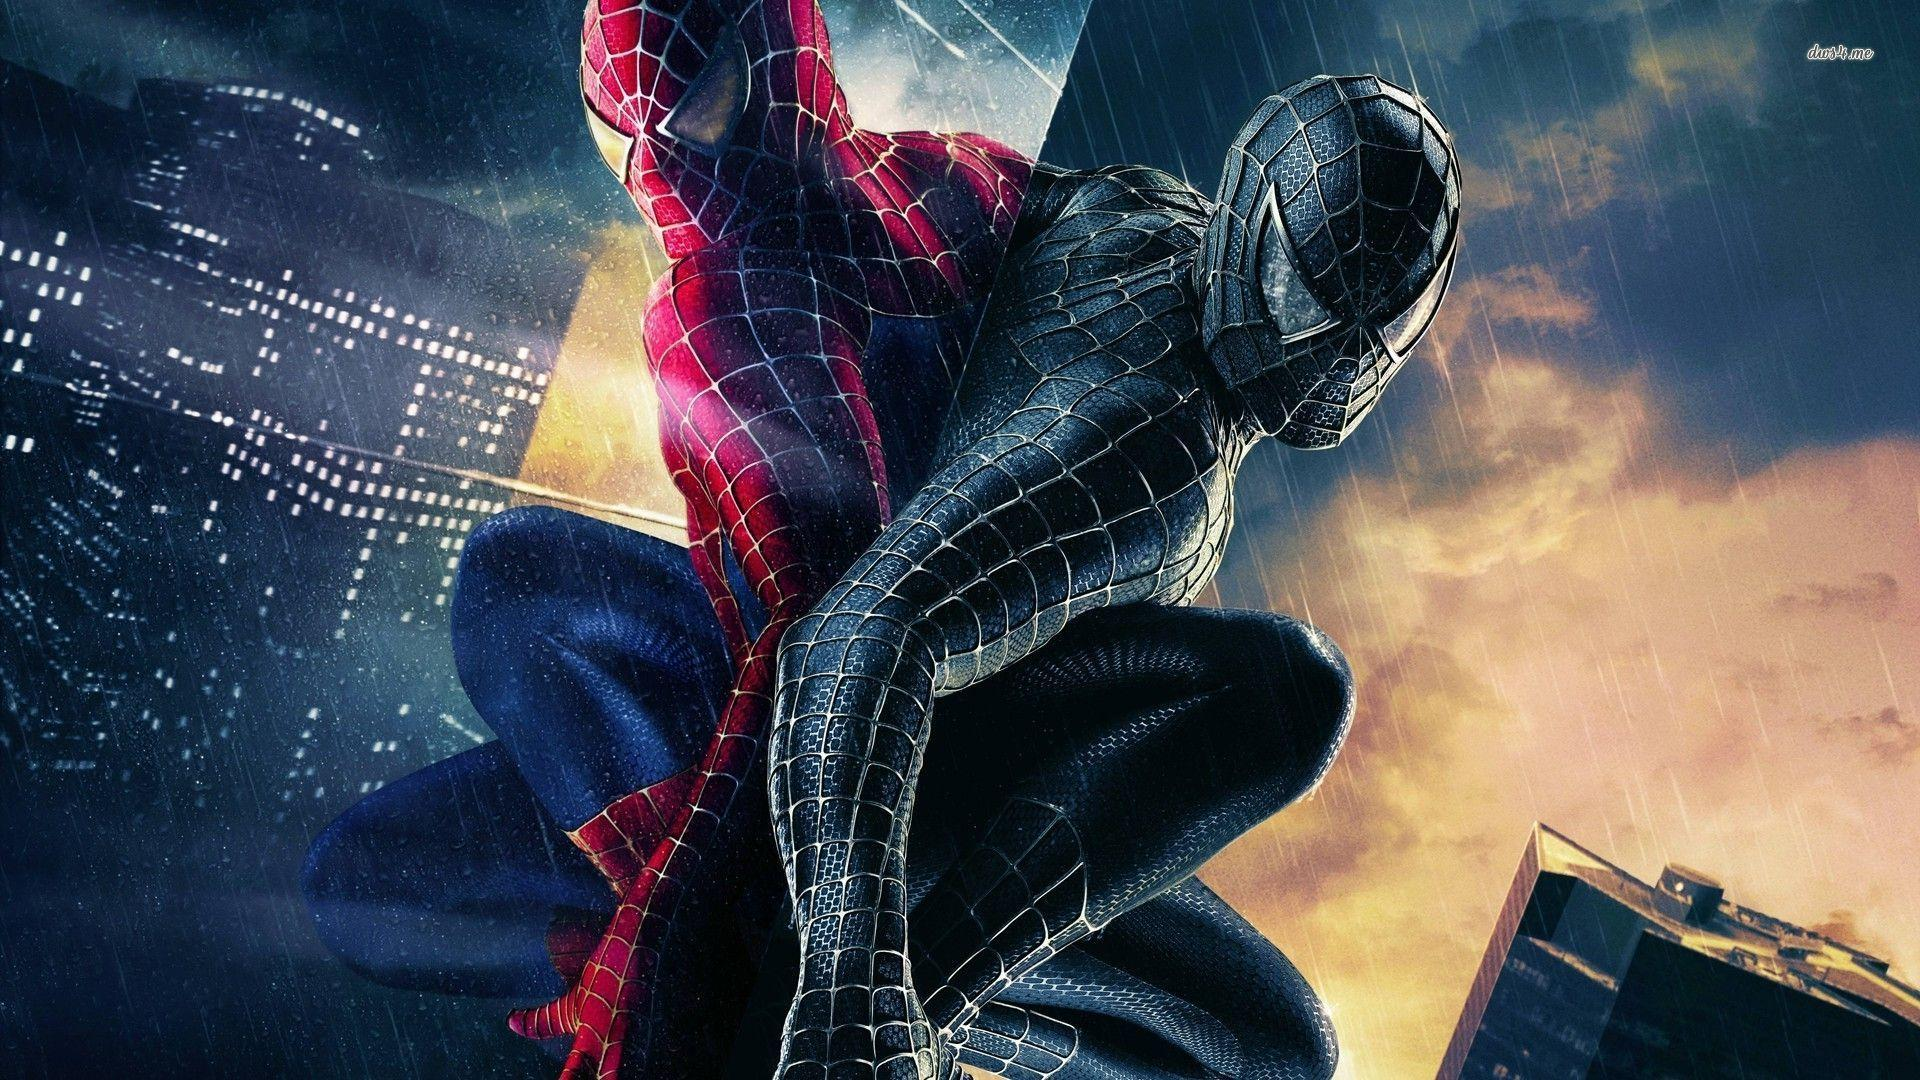 Spiderman 3 Wallpapers Hd Wallpaper Cave